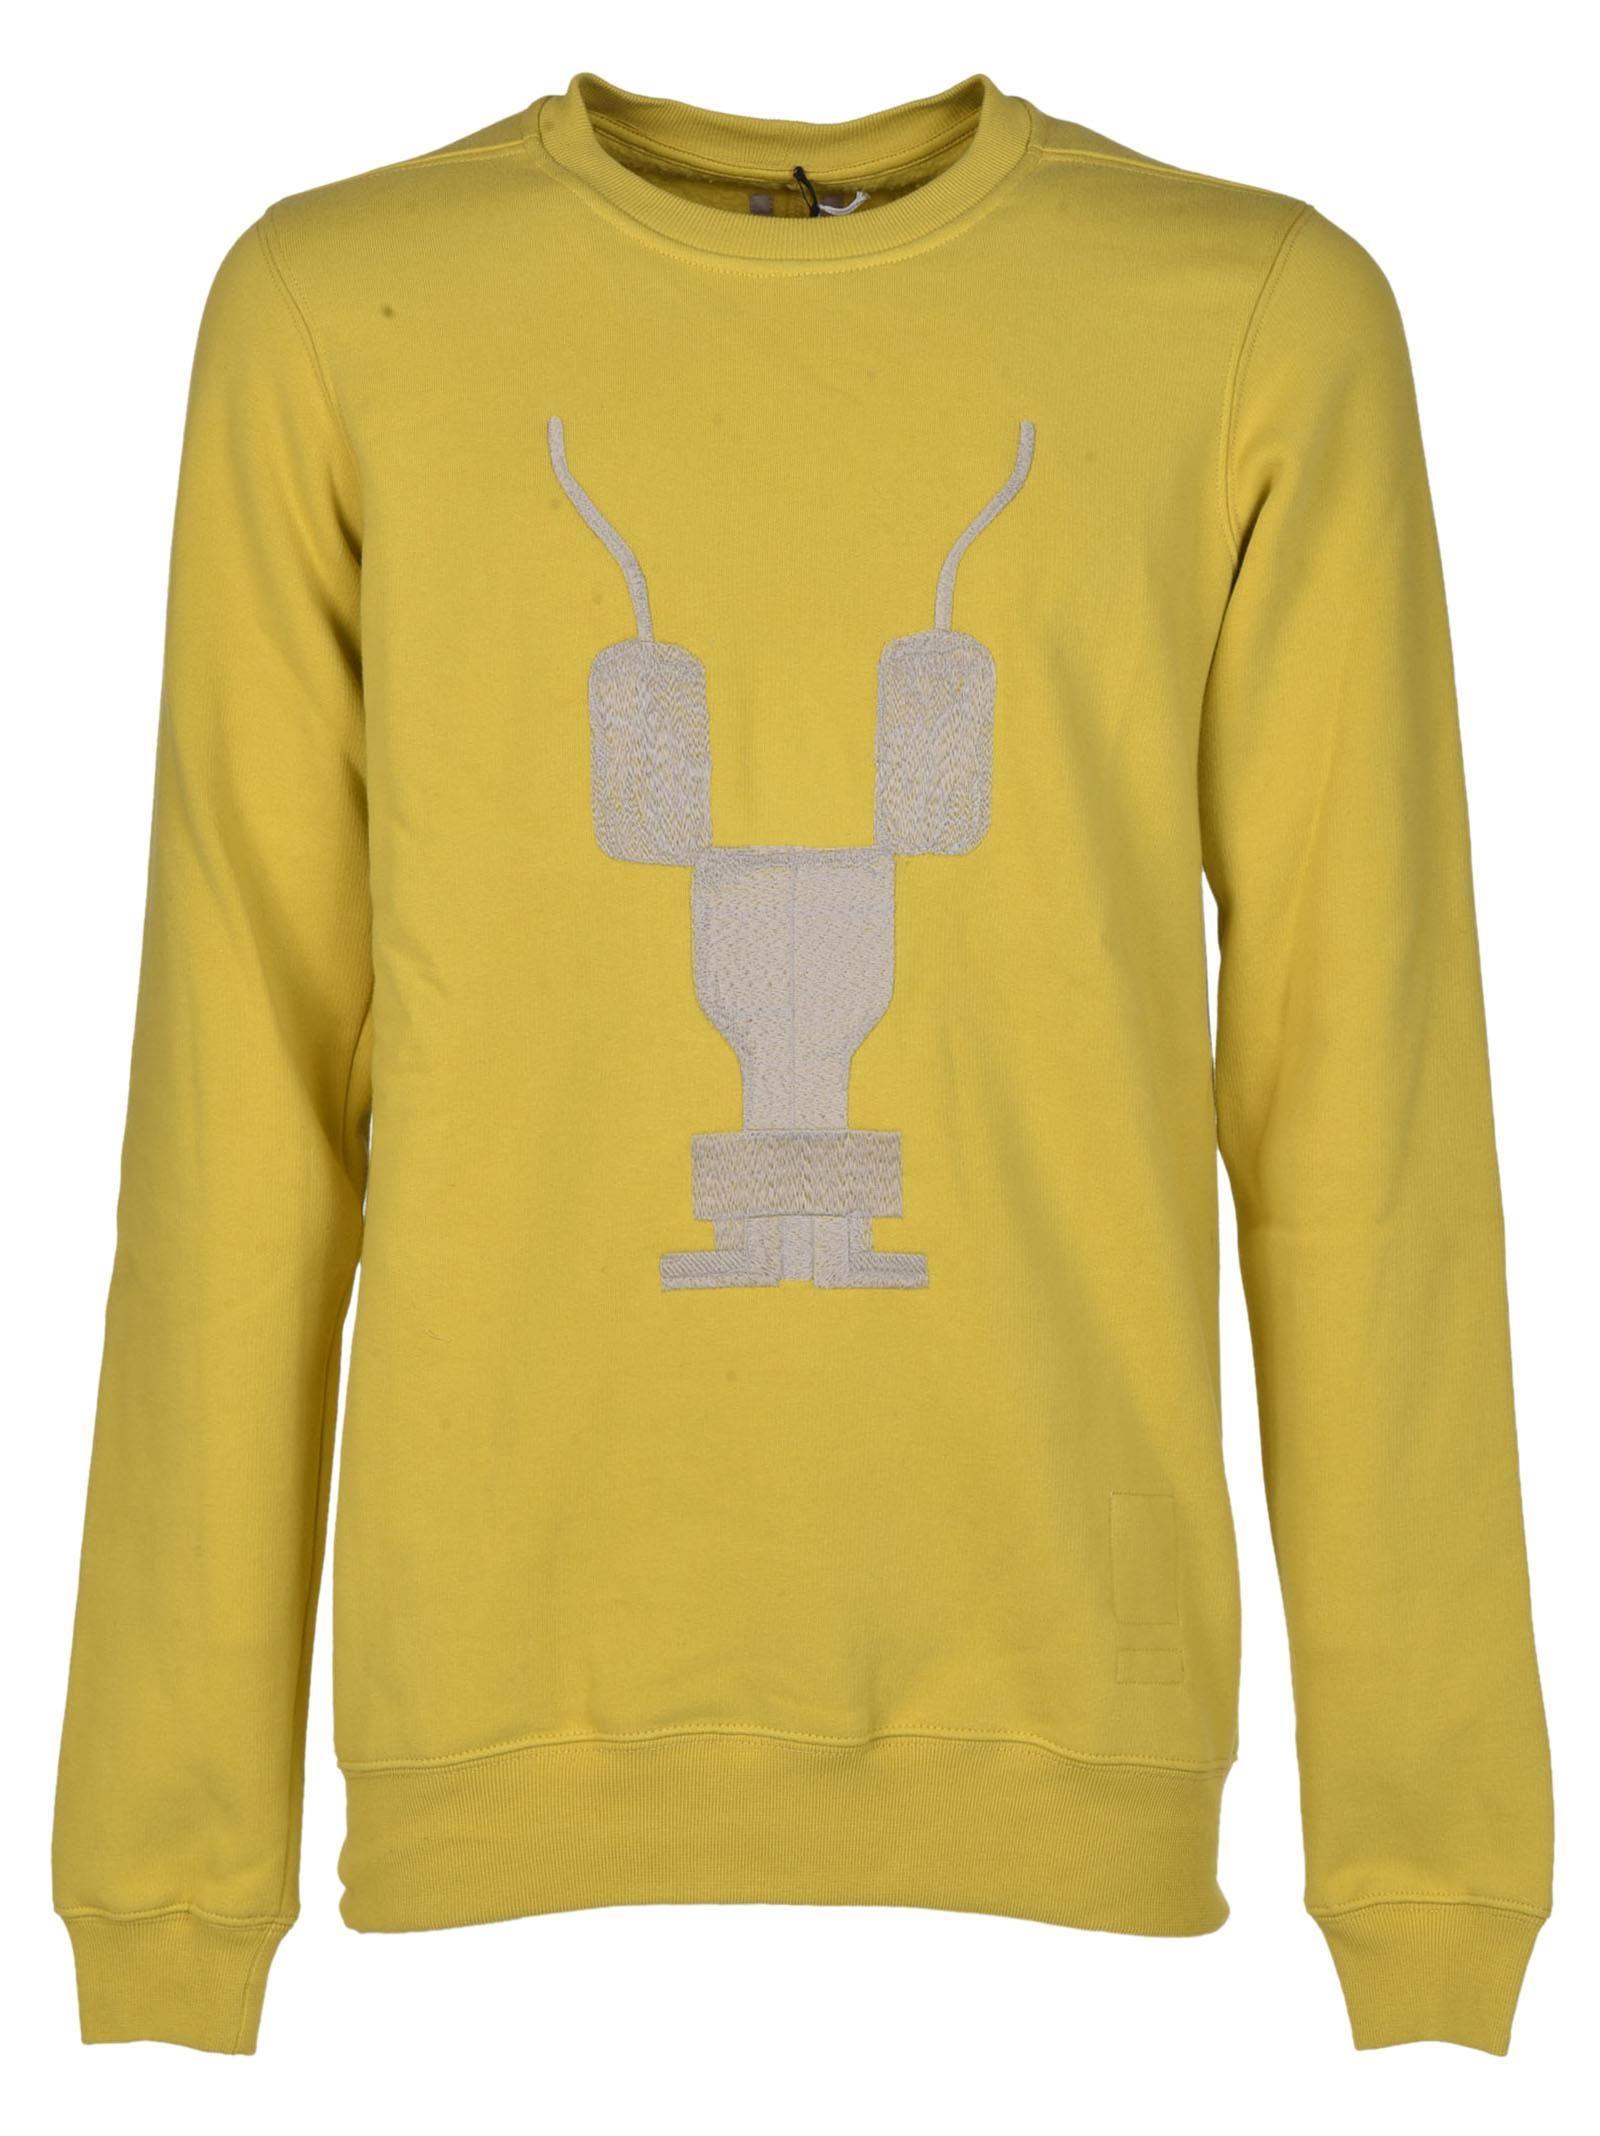 Rick Owens Drkshdw Embroidered Sweatshirt